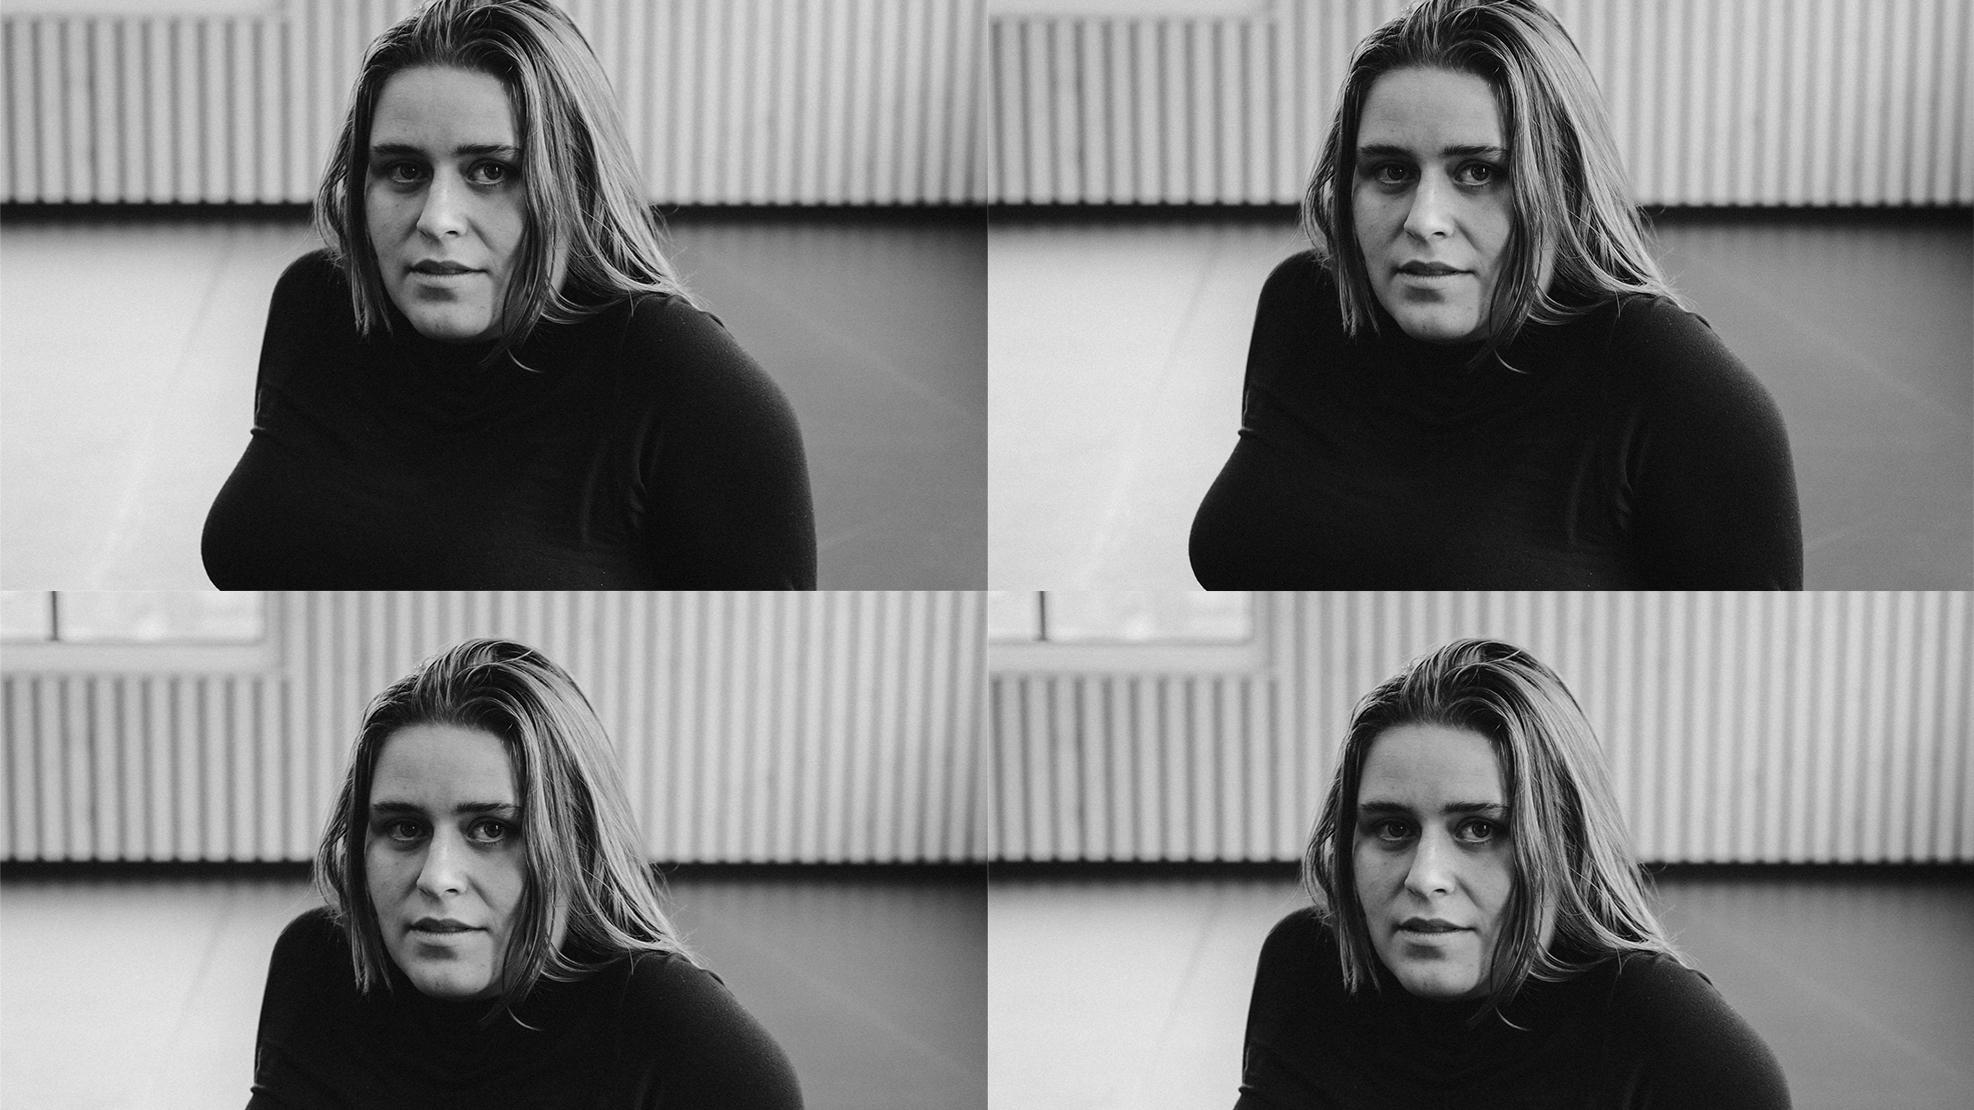 FEM SPØRSMÅL: MARIE KALLEVIK STRAUME